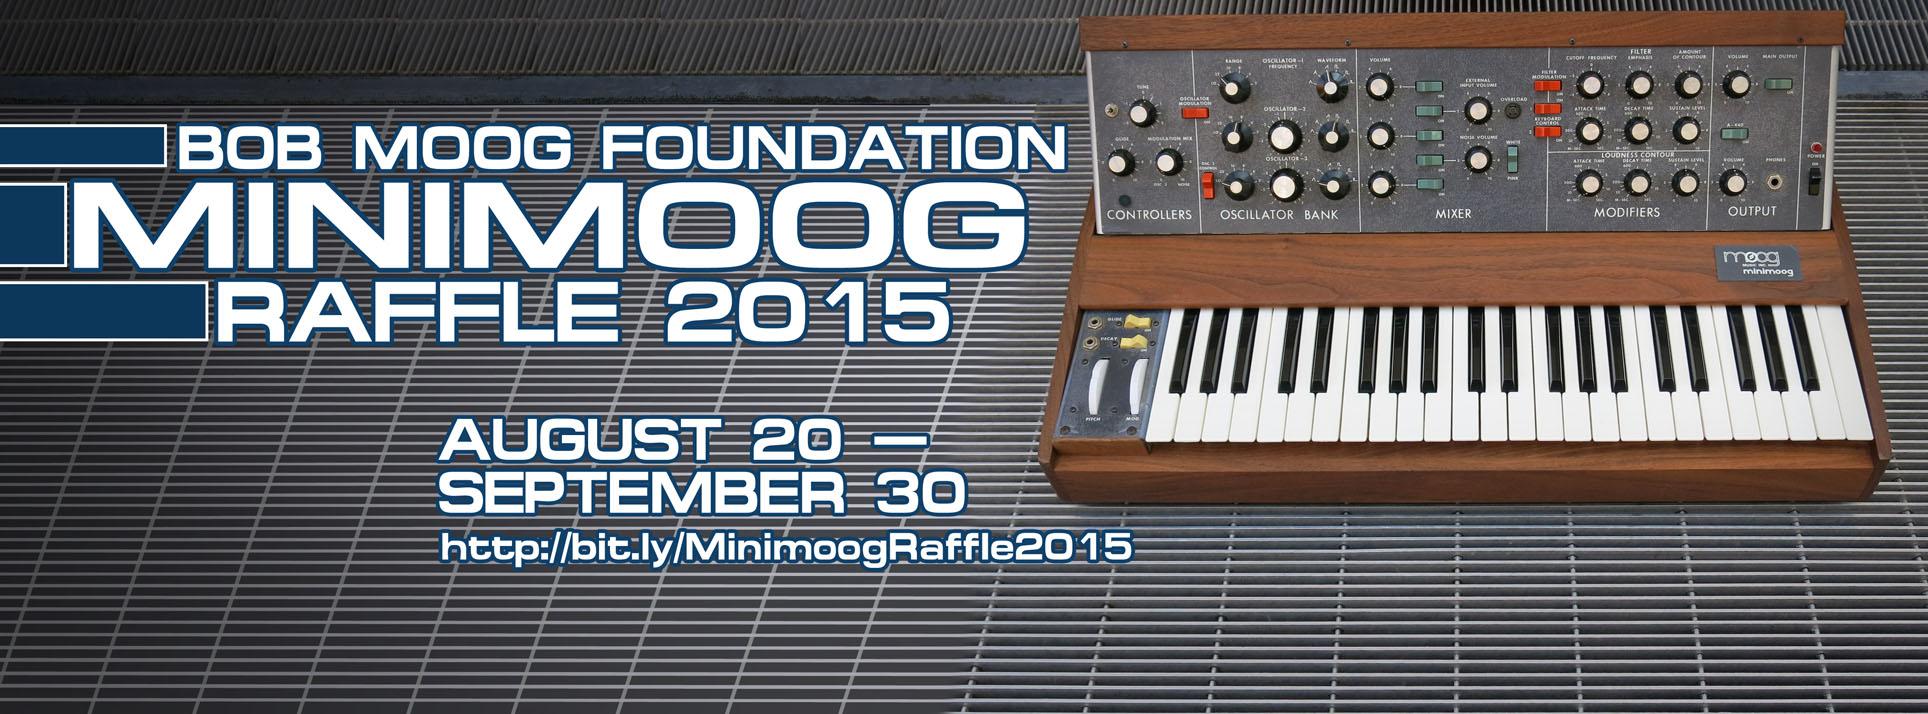 2015 Minimoog Raffle FB Cover2-blogheader